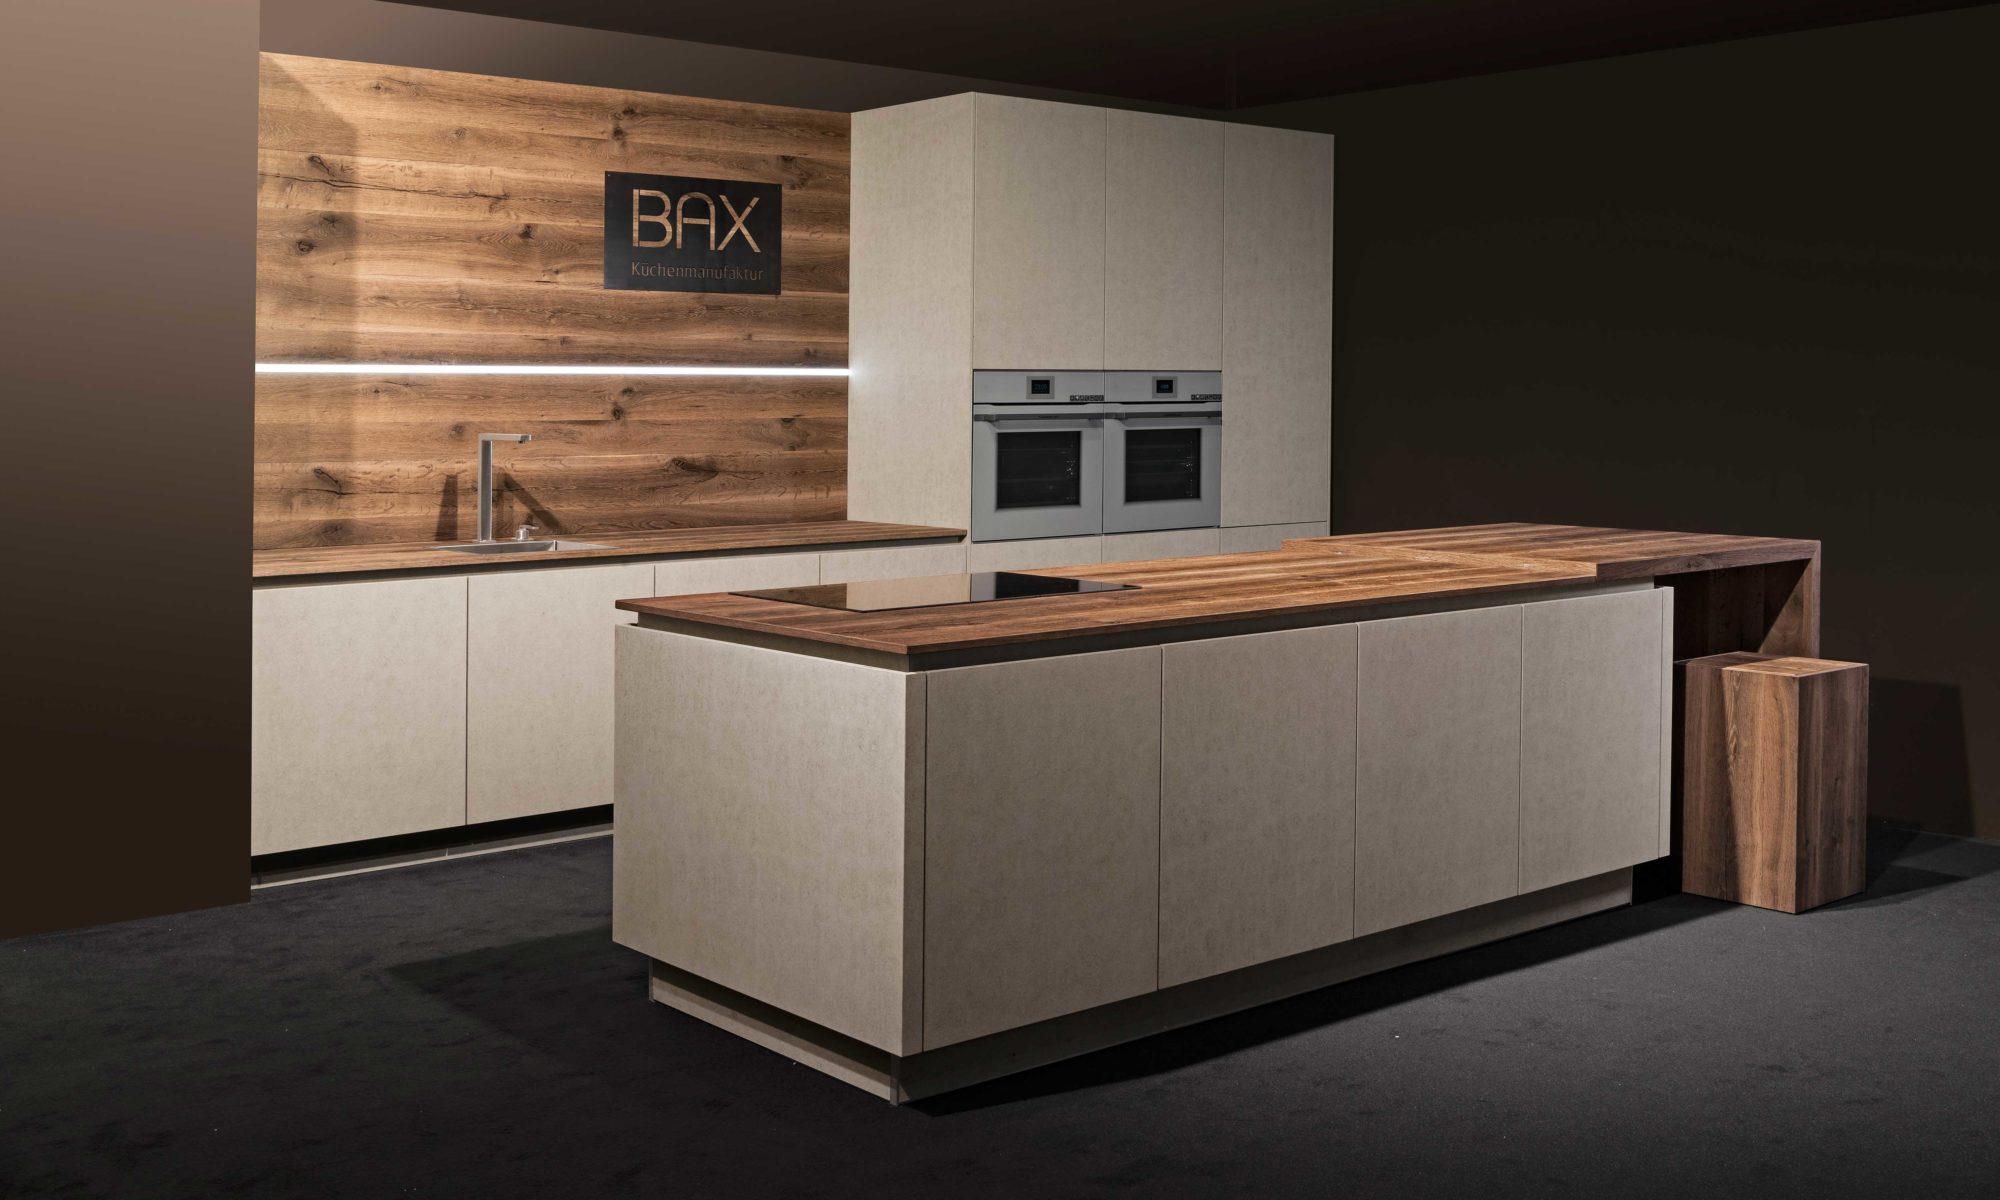 BAX, Küche, modern, Design, Betonoptik, Holz